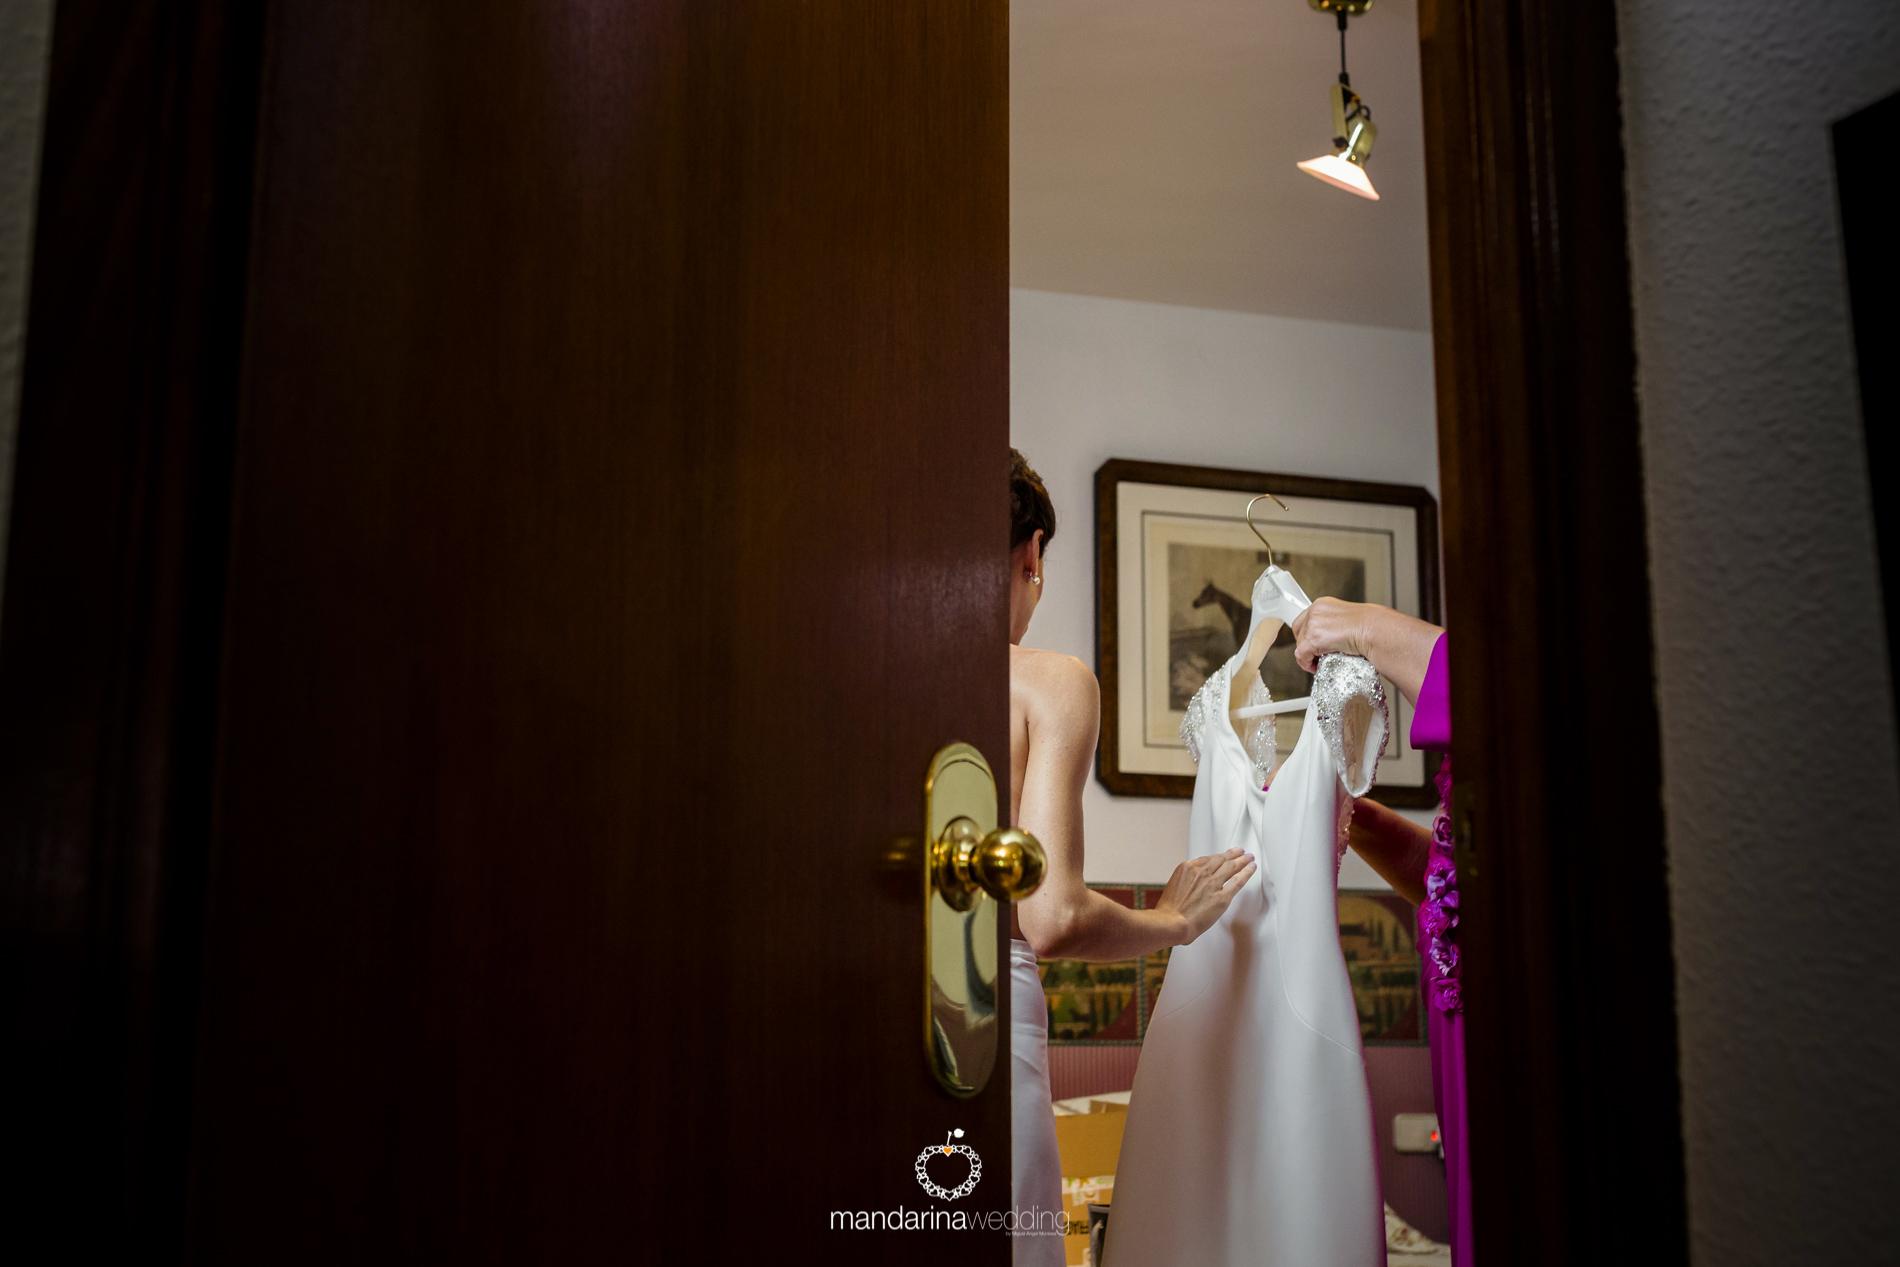 mandaria wedding, fotografos de boda, fotoperiodismo de boda, mejores fotografos de boda, bodas soria, bodas pirineo, bodas Madrid, fotógrafos tarragona_04